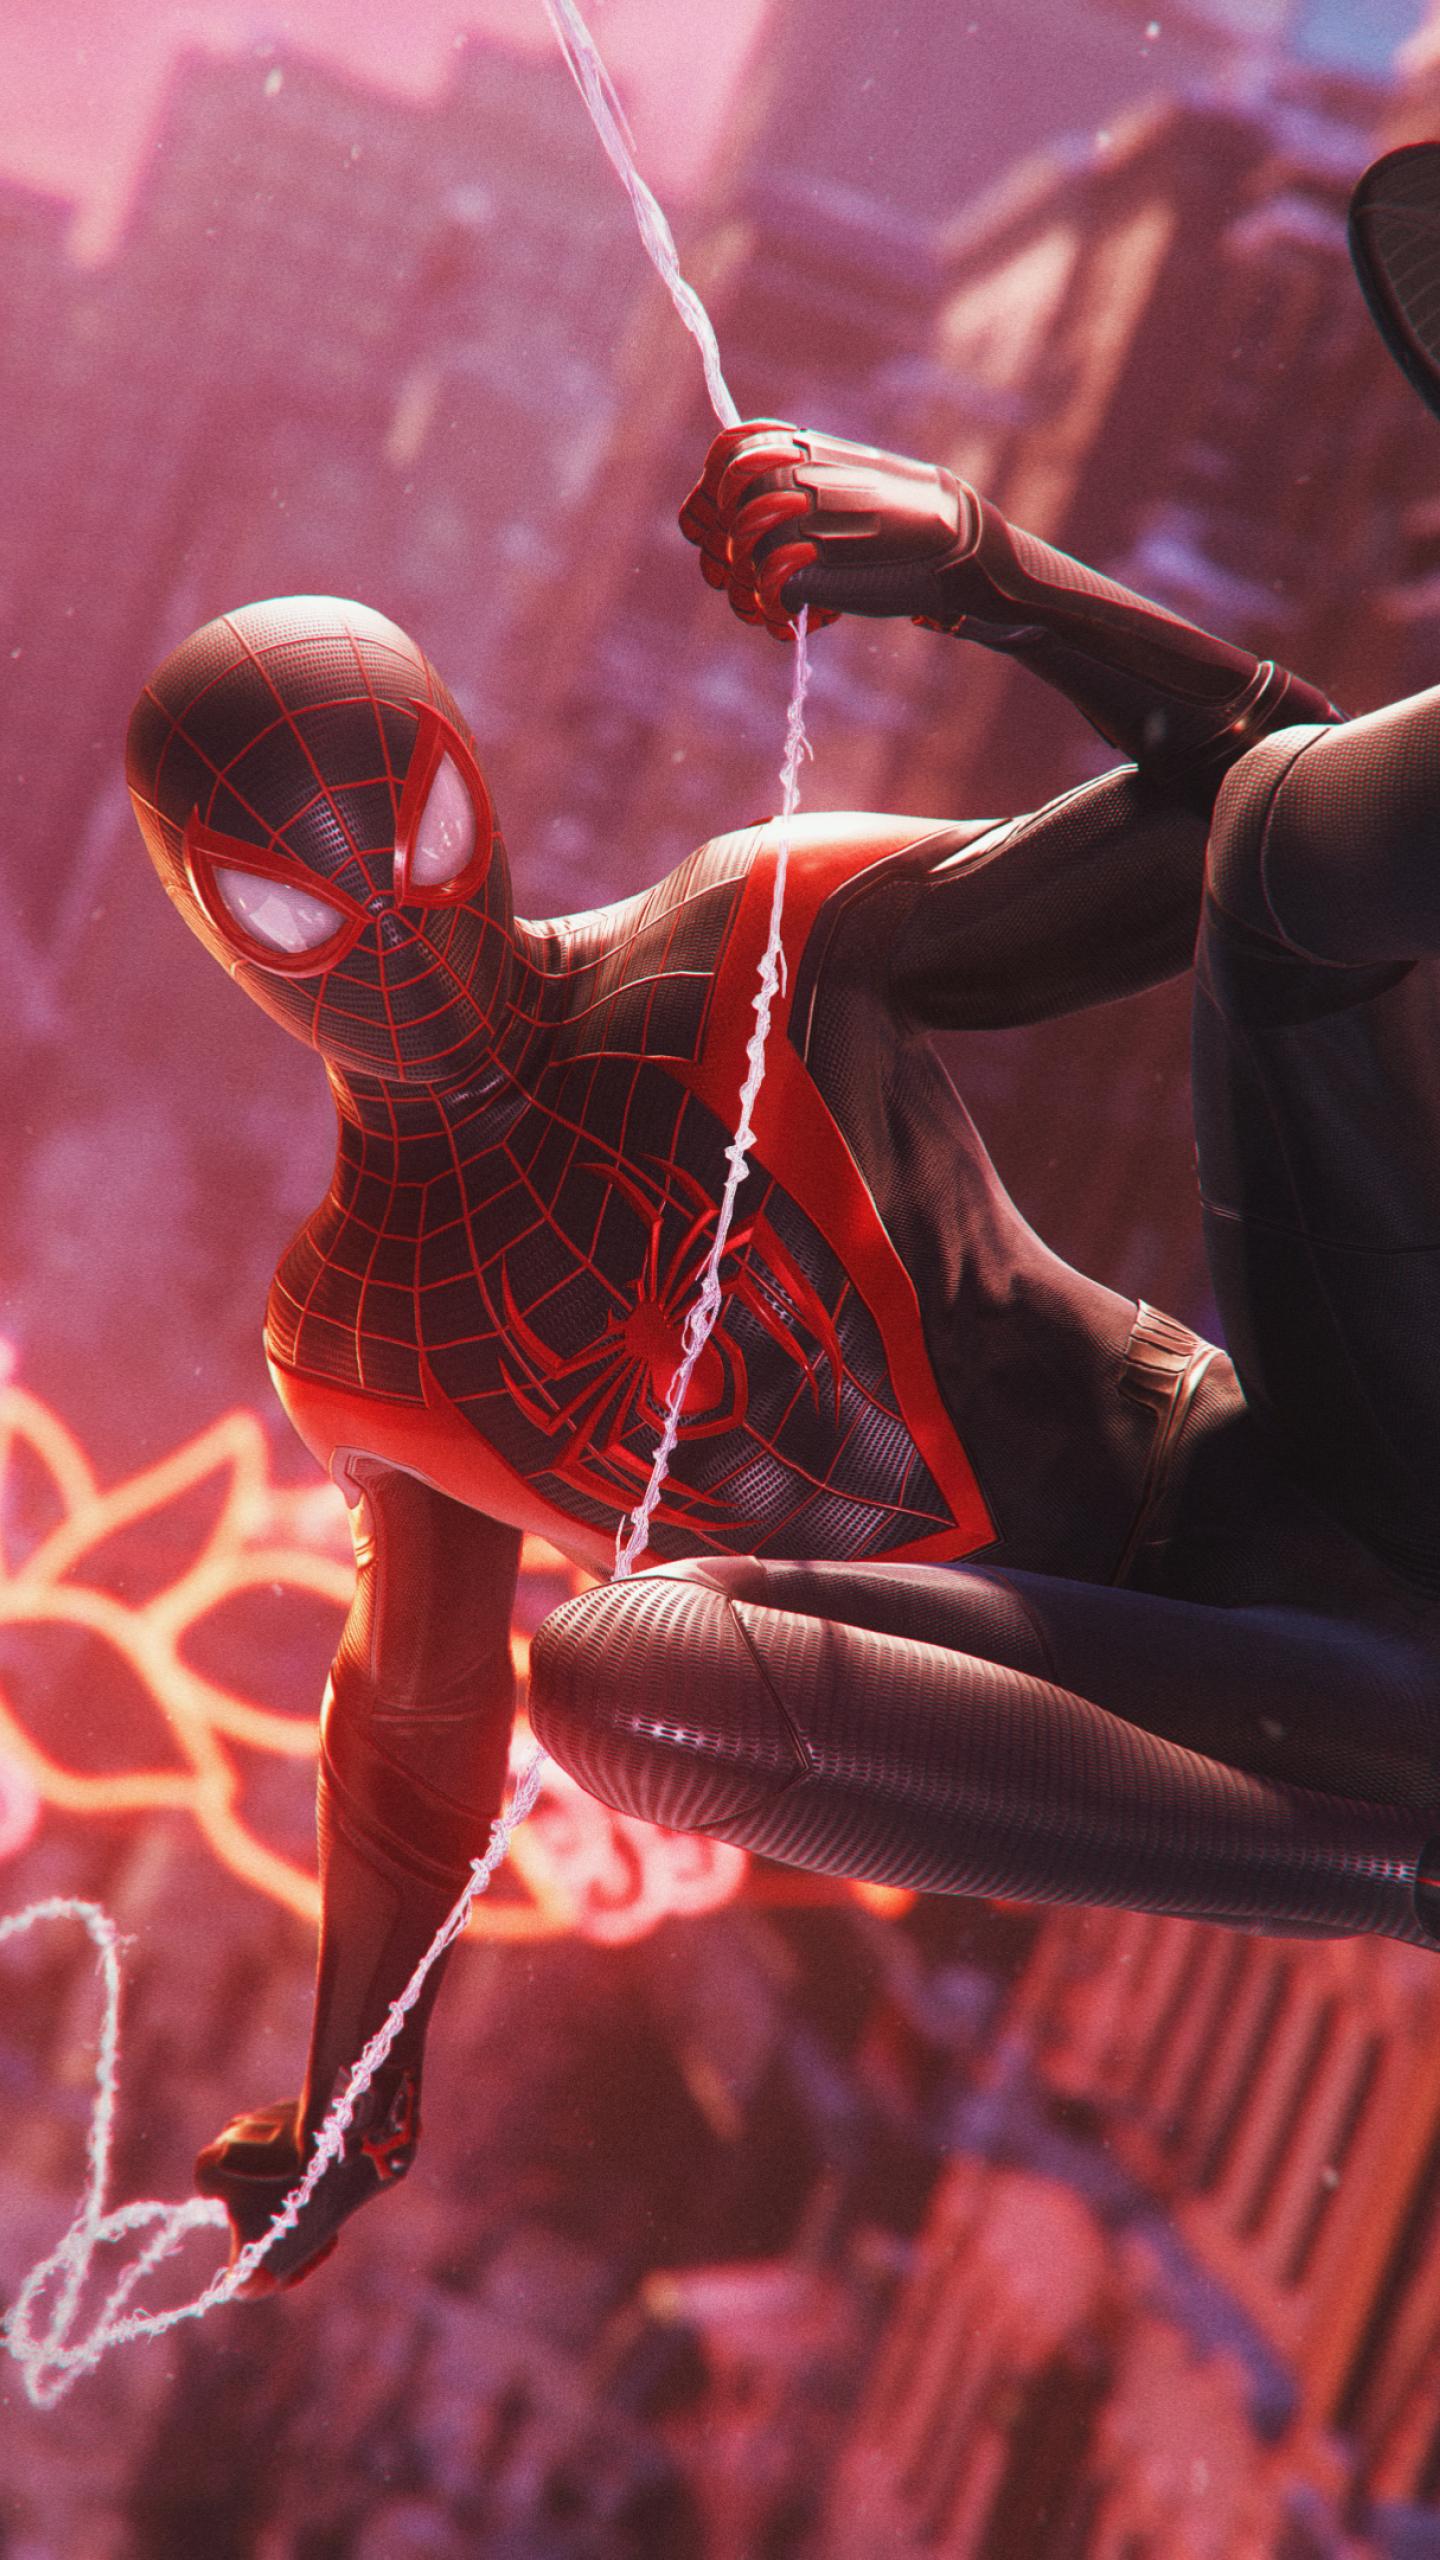 1440x2560 Spider-Man Miles Morales 4K Marvels Samsung ...